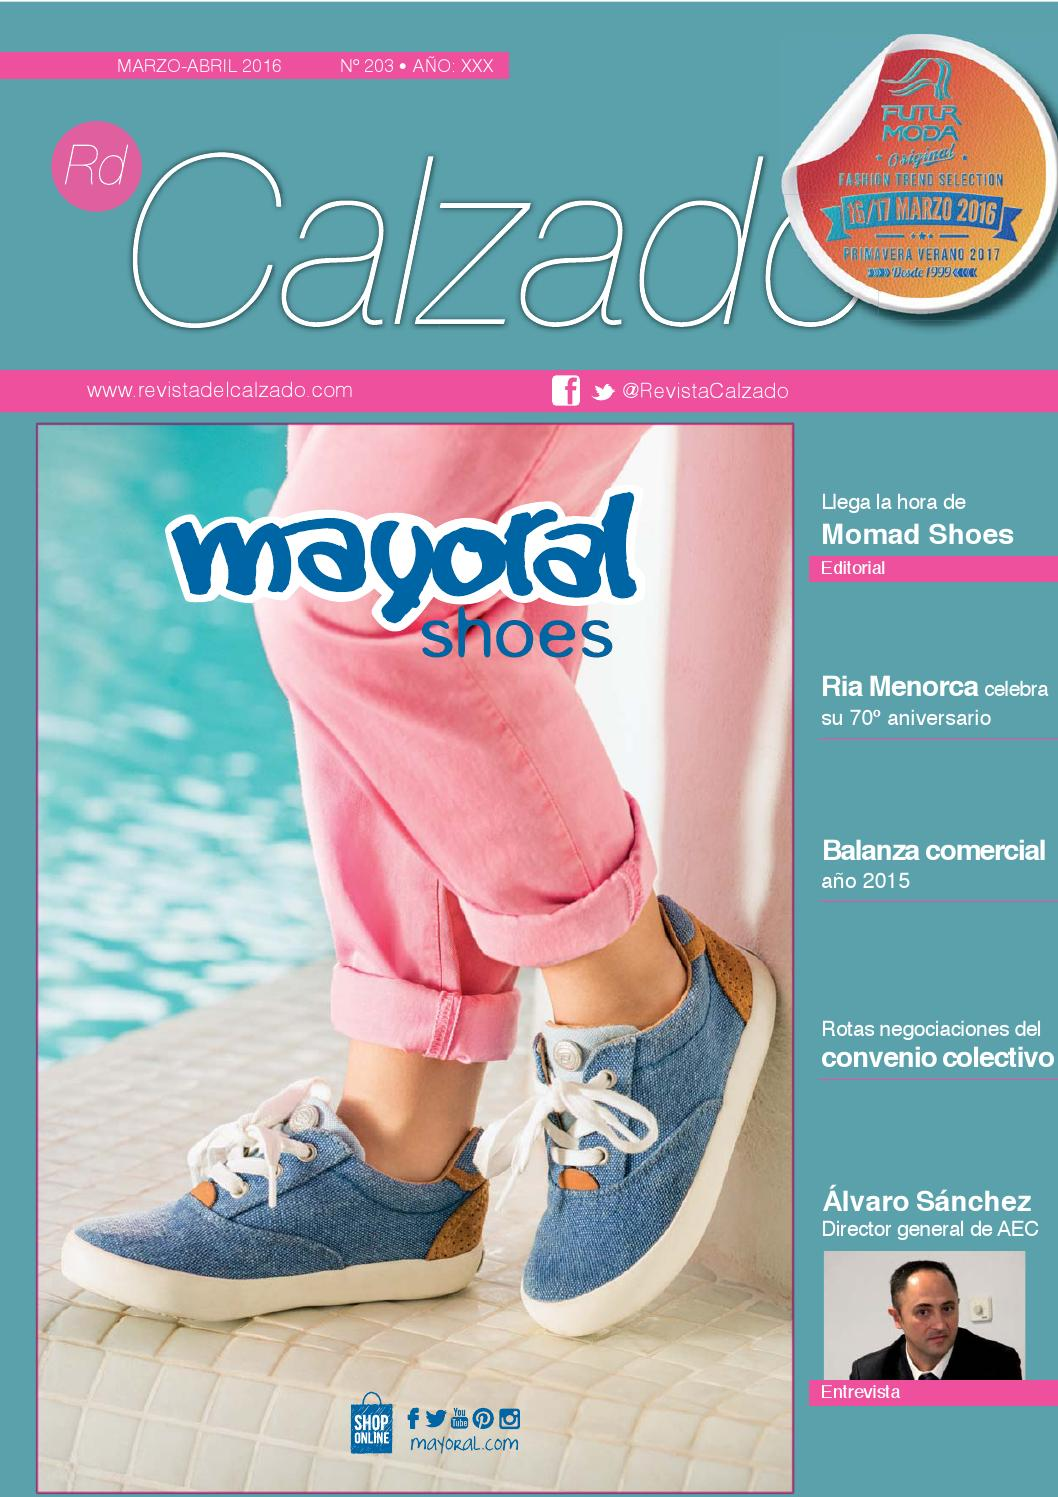 23a42167 Revista del Calzado nº 203 by Mundipress, s.l. - issuu